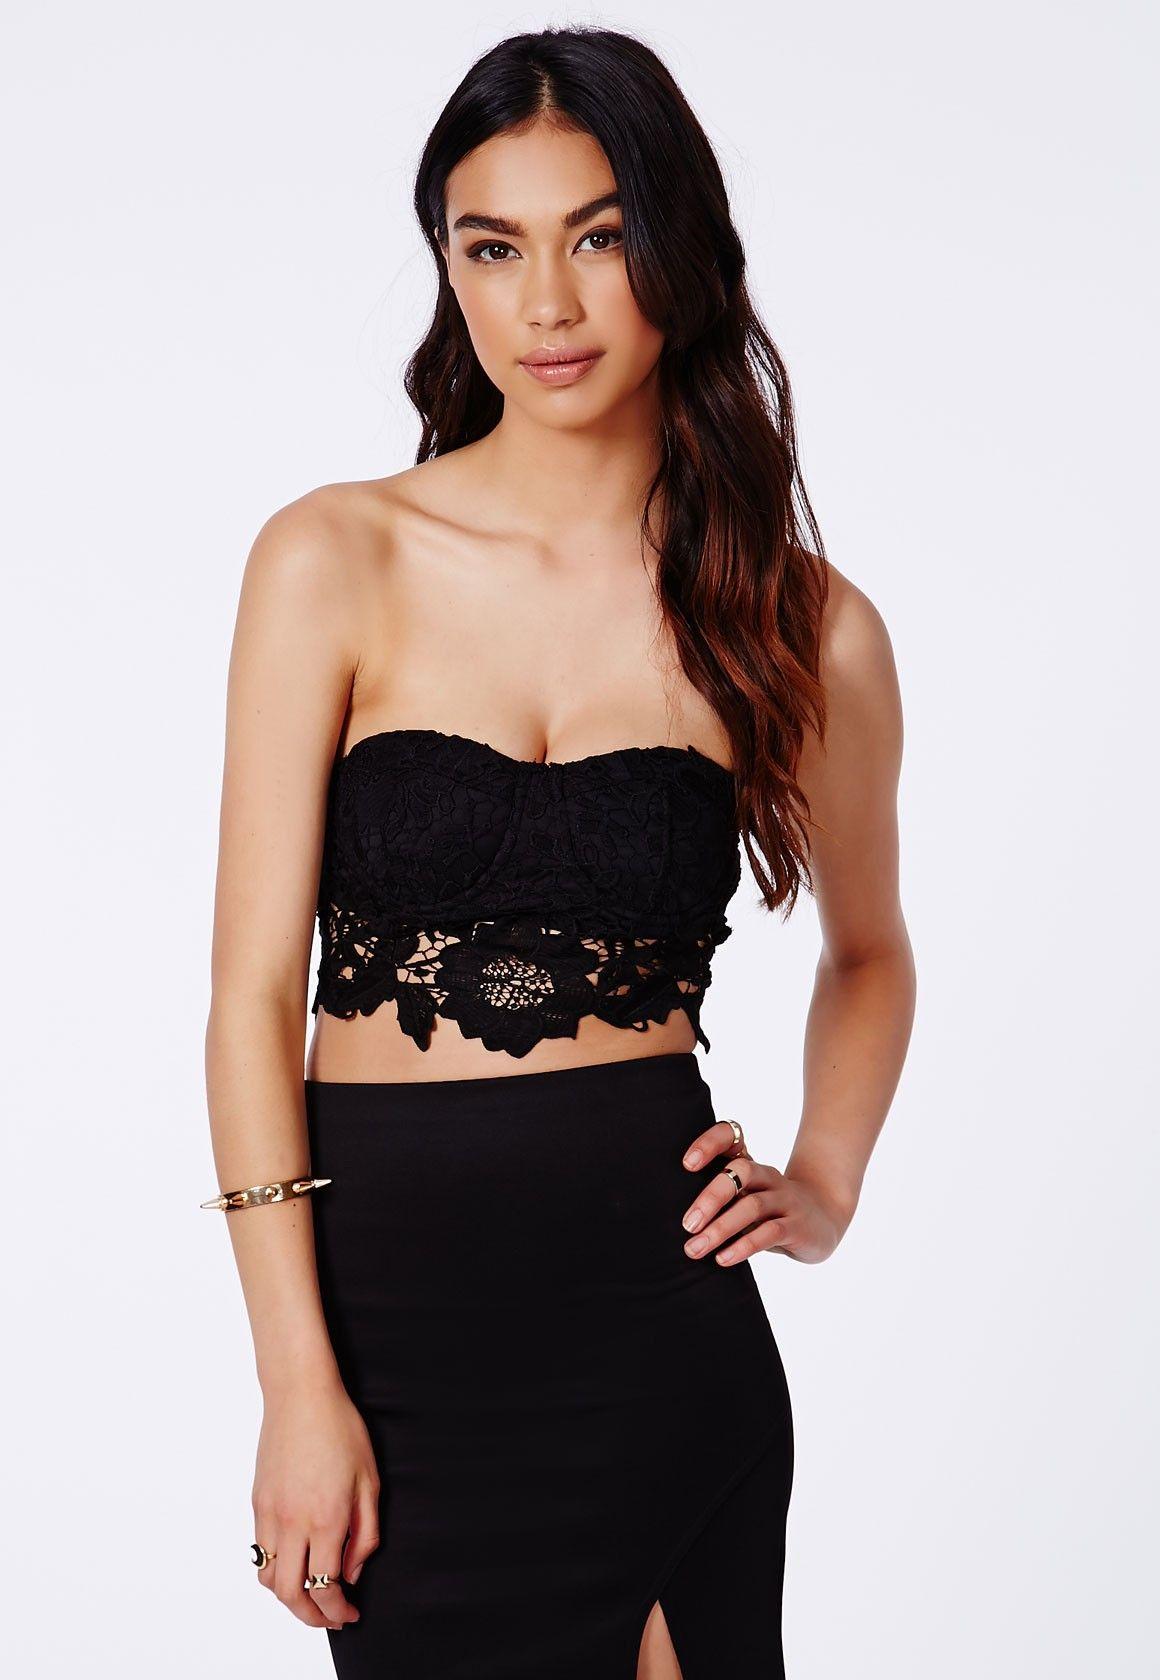 Chic Black Lace Bralette Outfit : Black Lace Bralette Outfit9 ...